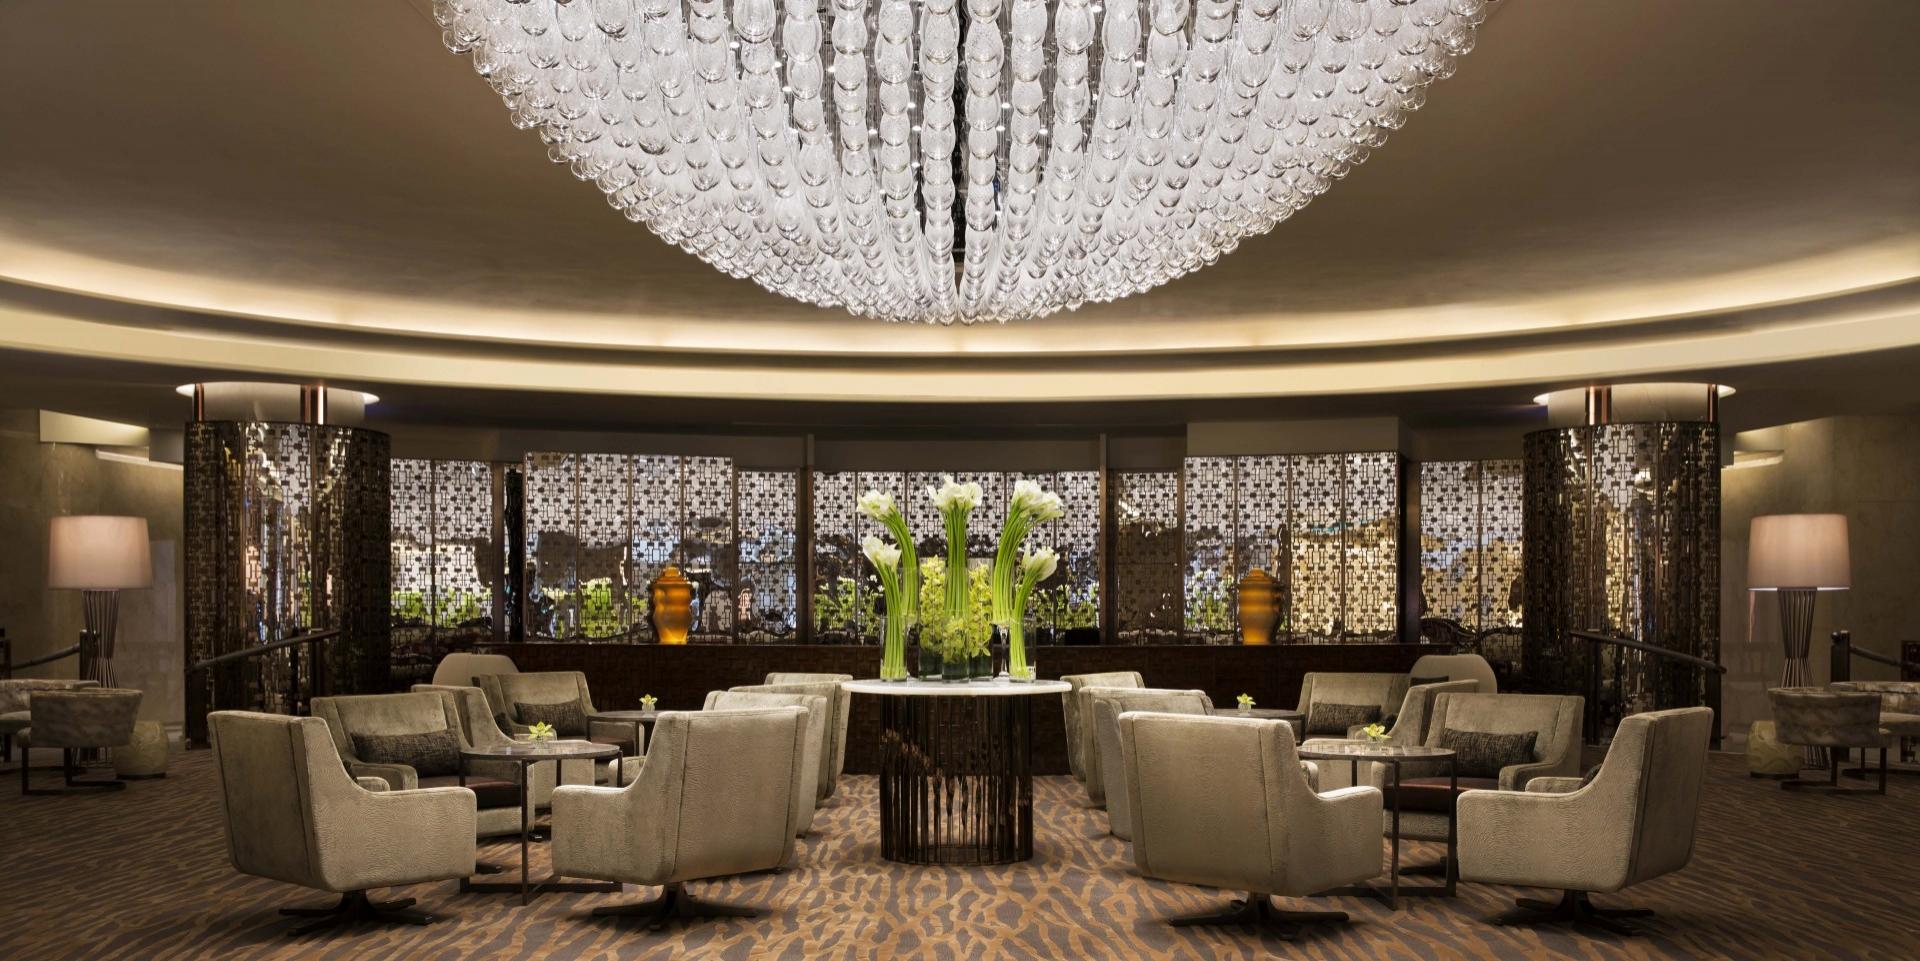 Hirsch Bedner Associates An Experience in Hospitality Interior Design 6